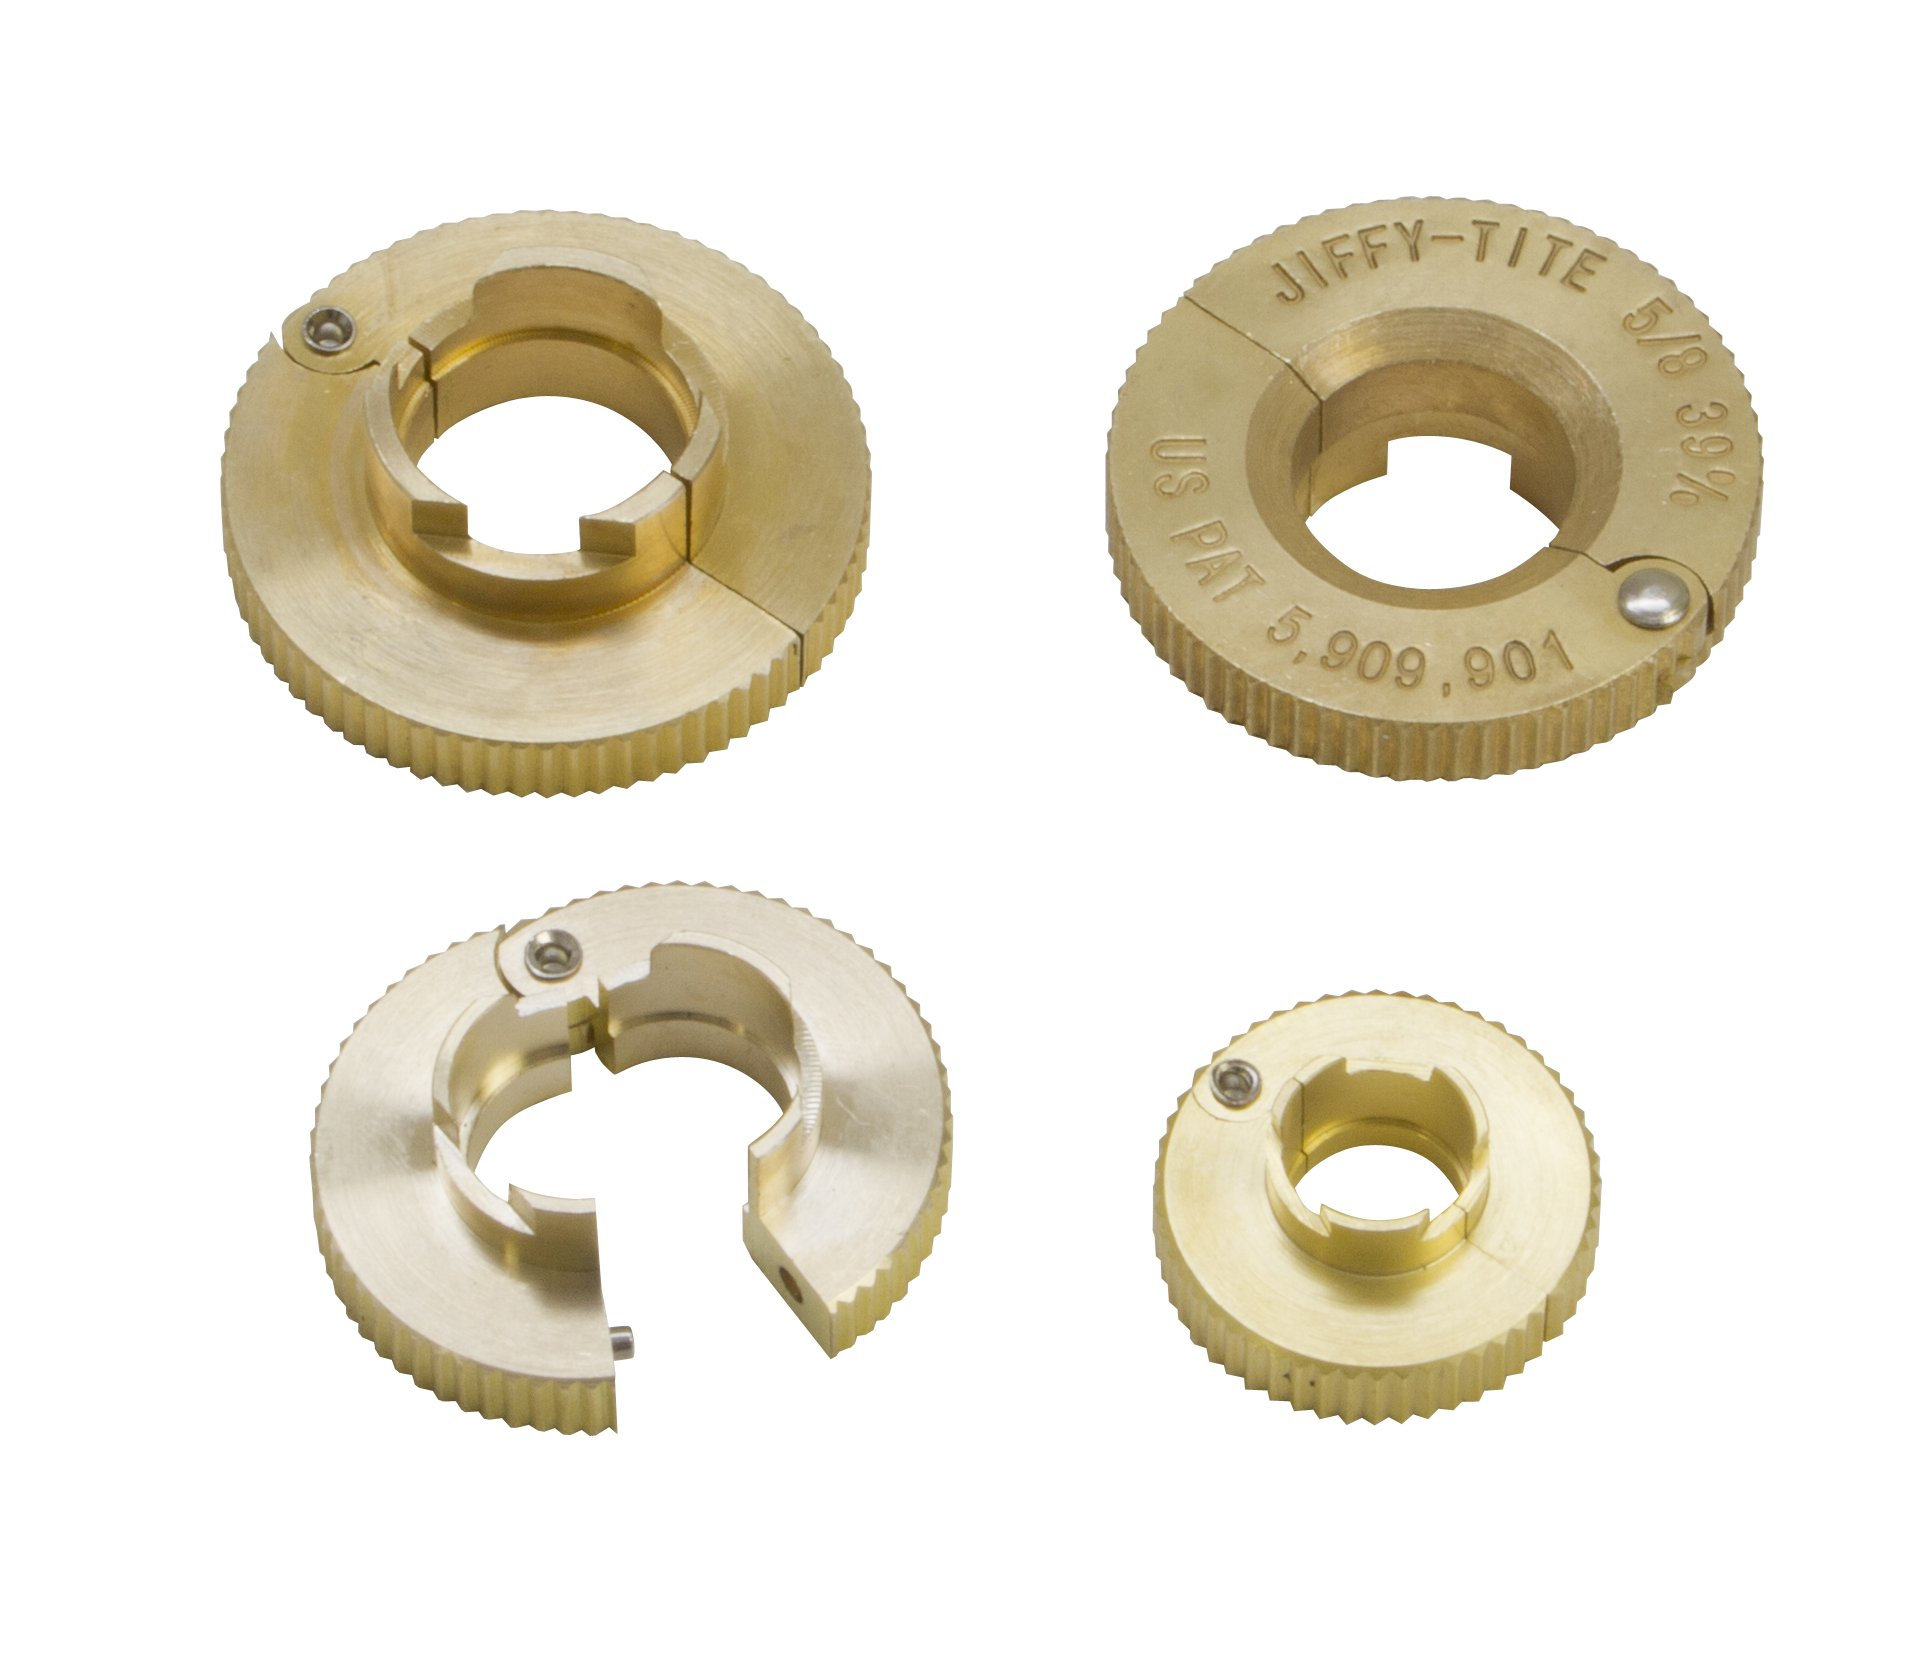 Lisle 22990 Jiffy-Tite 4-Piece Low Profile Disconnect Set by Lisle